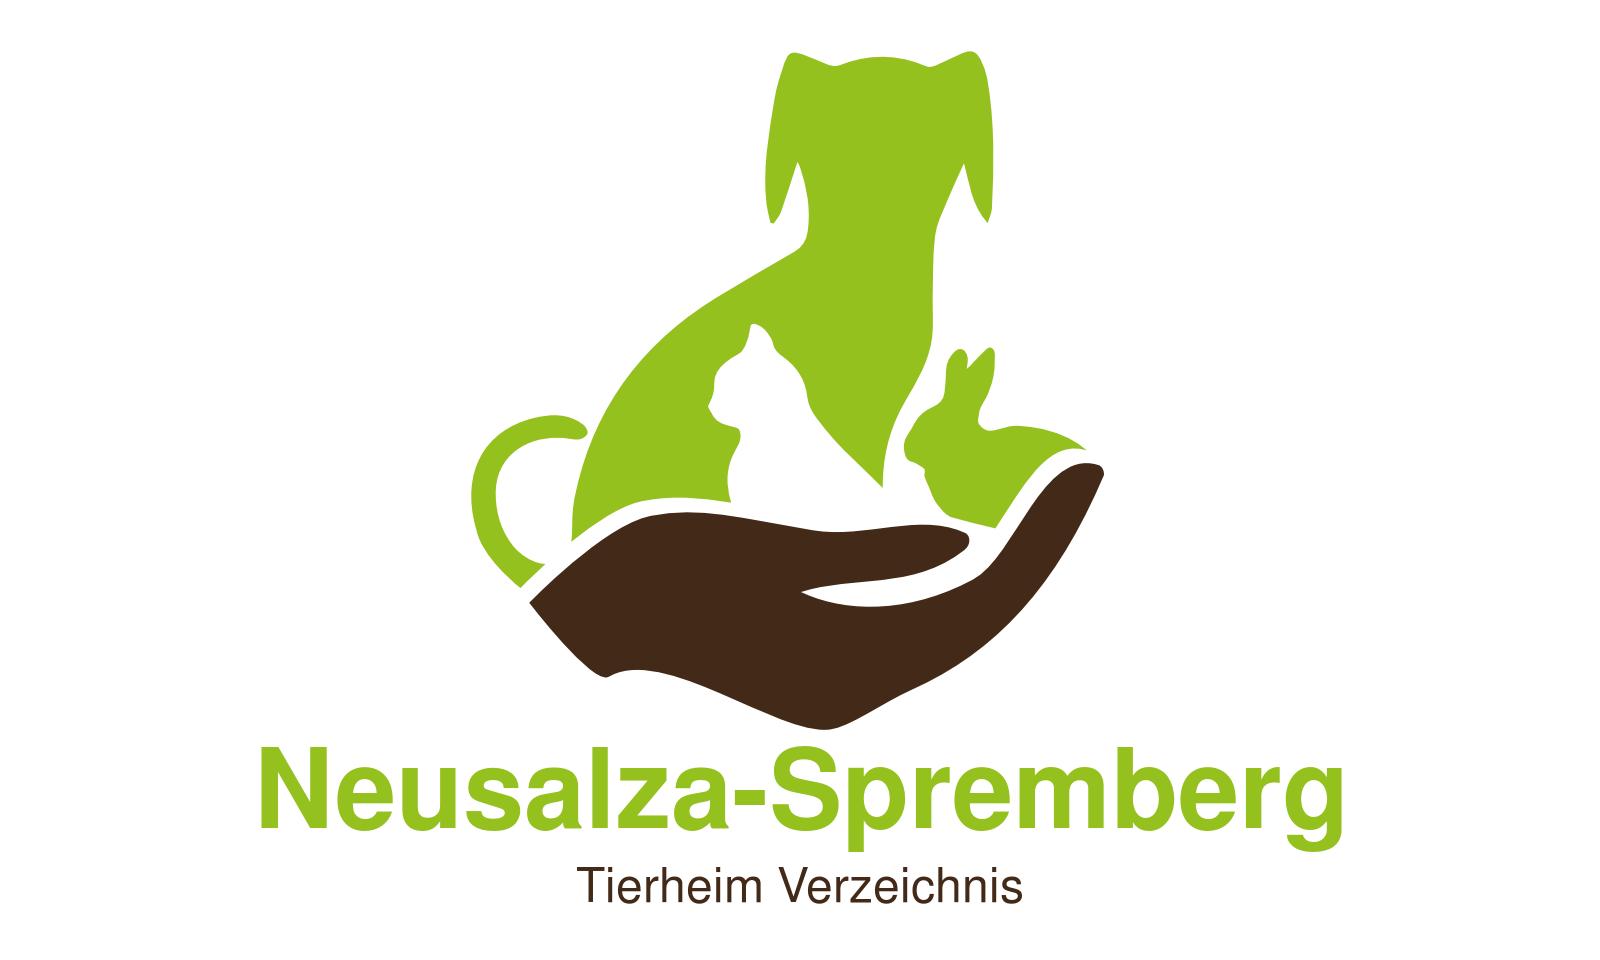 Tierheim Neusalza-Spremberg